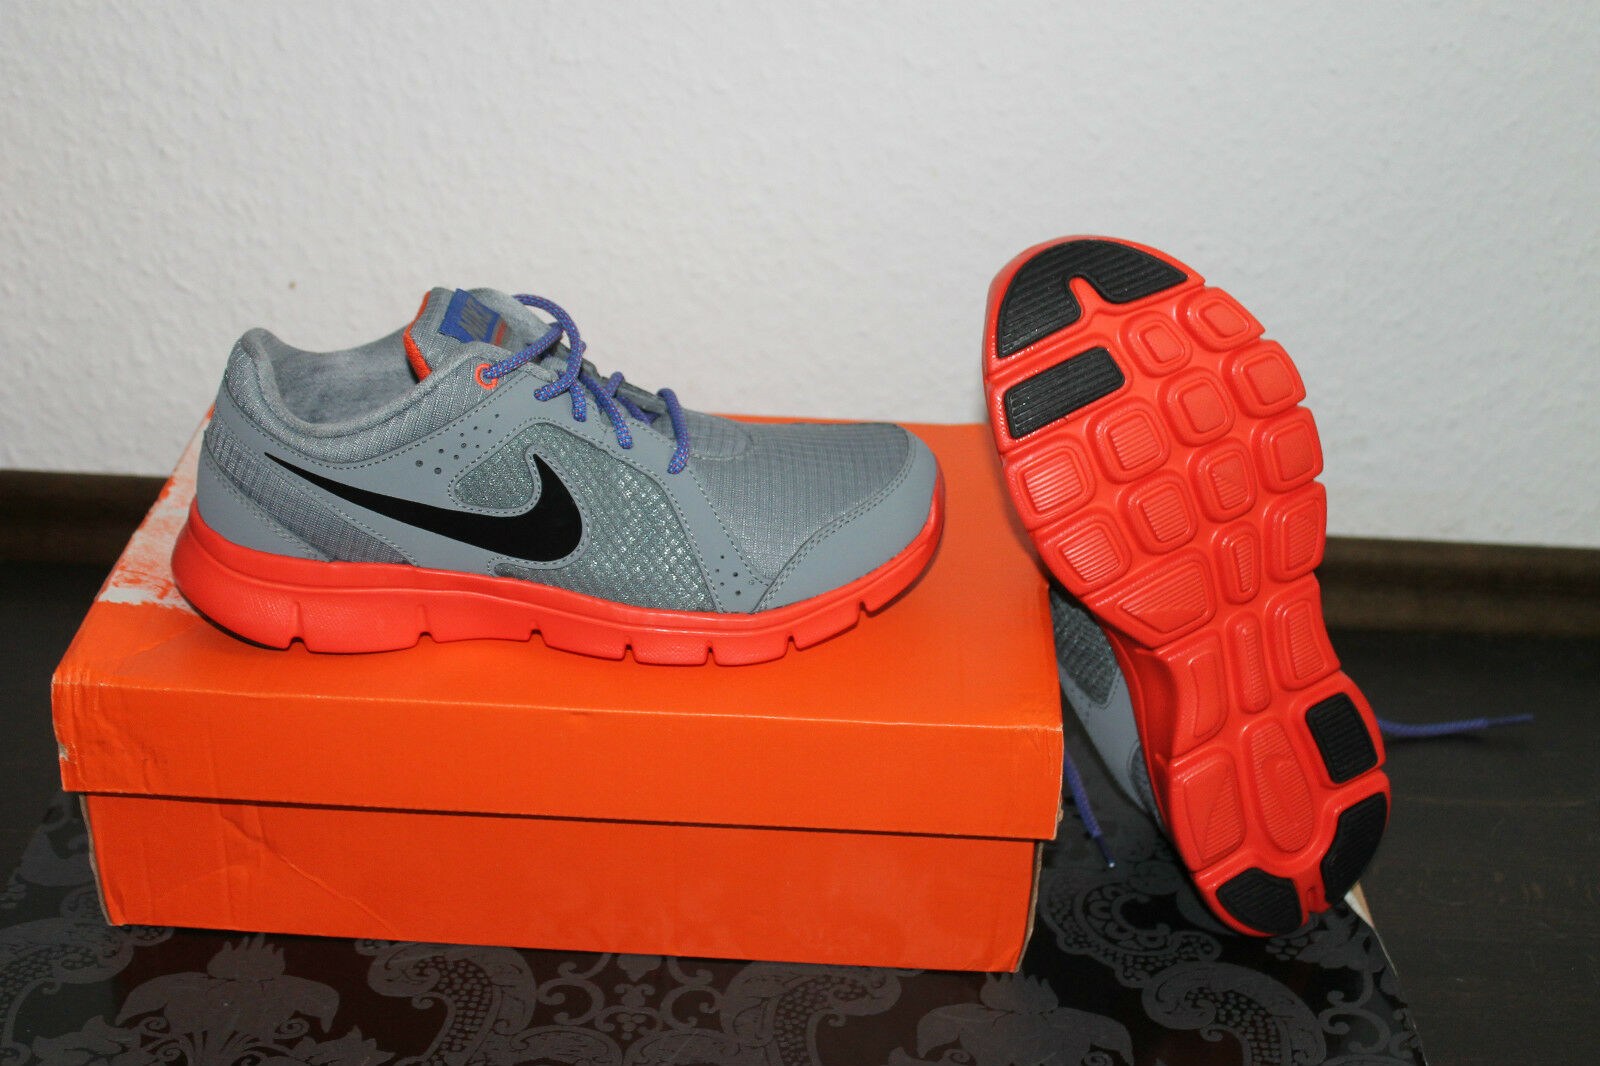 Nike Flex Damen Damen Damen Running  Lauf Schuhe Grau Orange Größe 38 oder 38 5 Neu ae0019